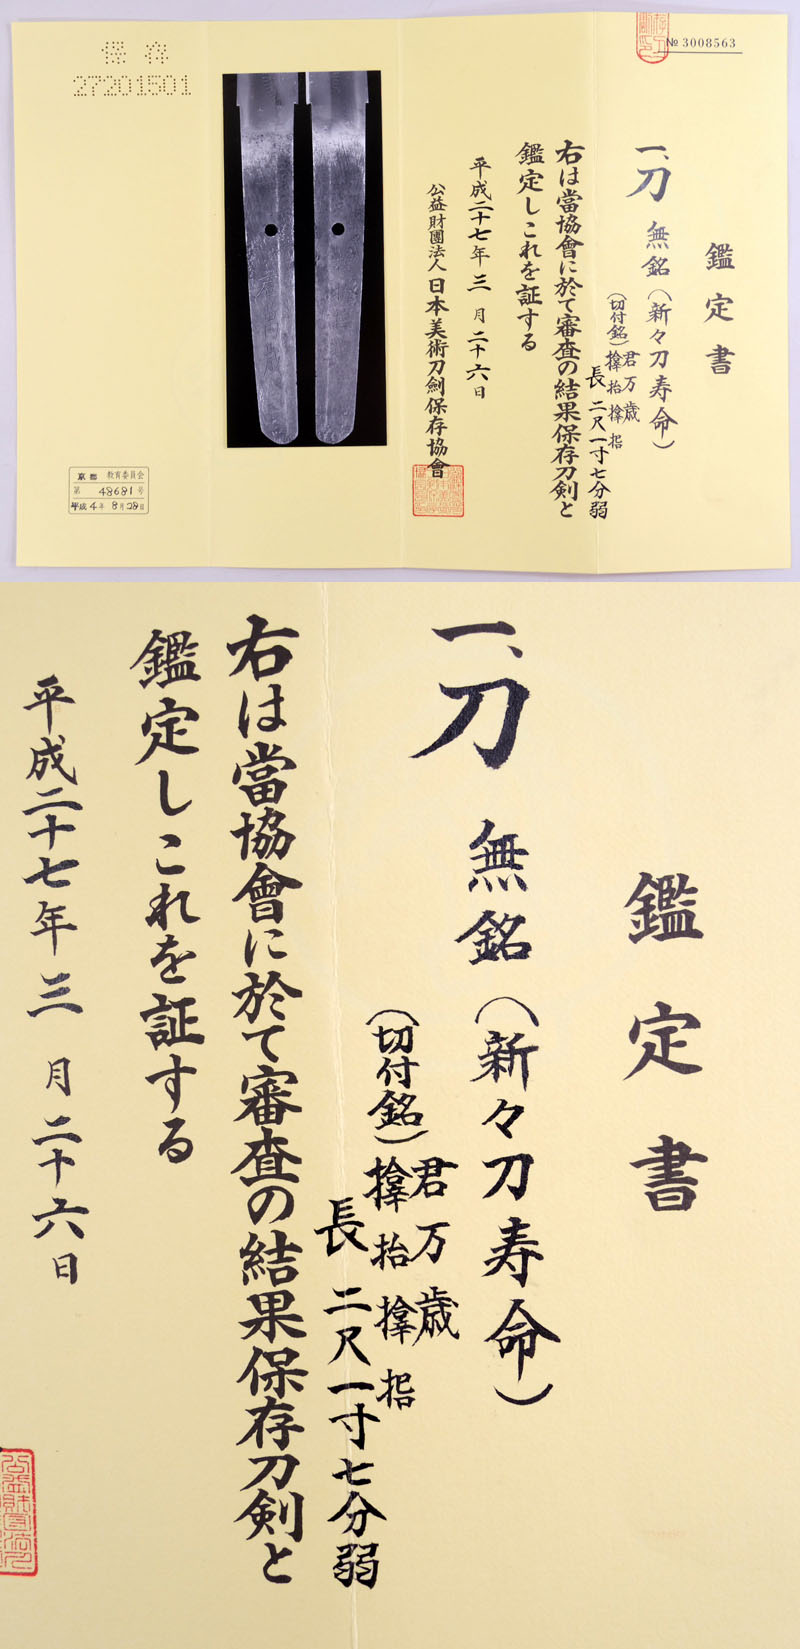 無銘(新々刀寿命) Picture of Certificate